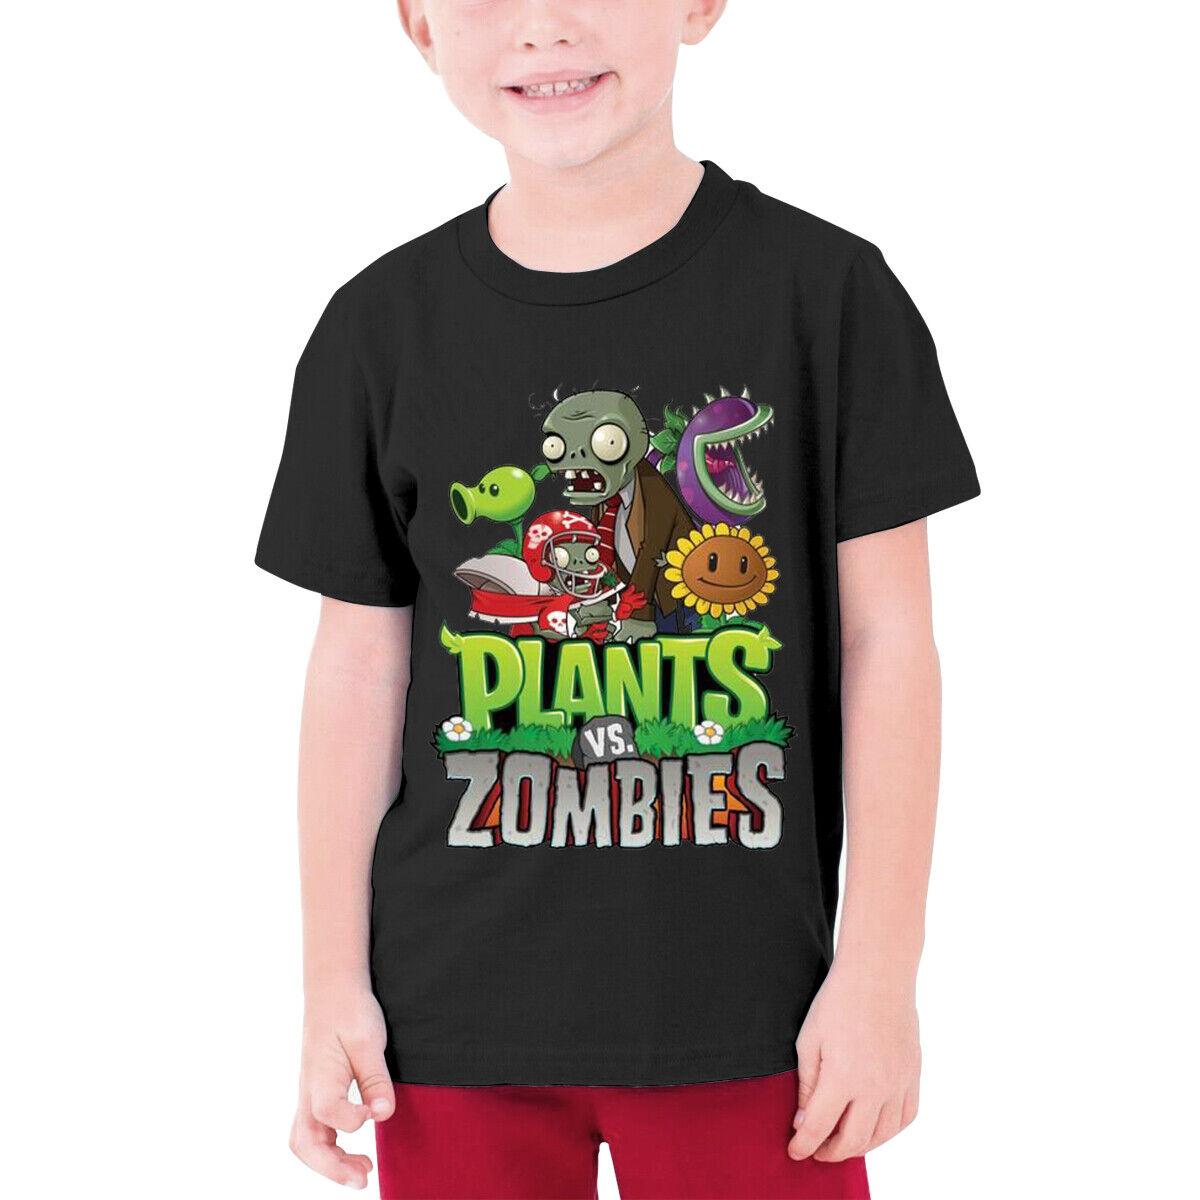 Plants vs Zombies Boys Girls Casual T-shirt Kids Short Sleeve Shirts Top Tee